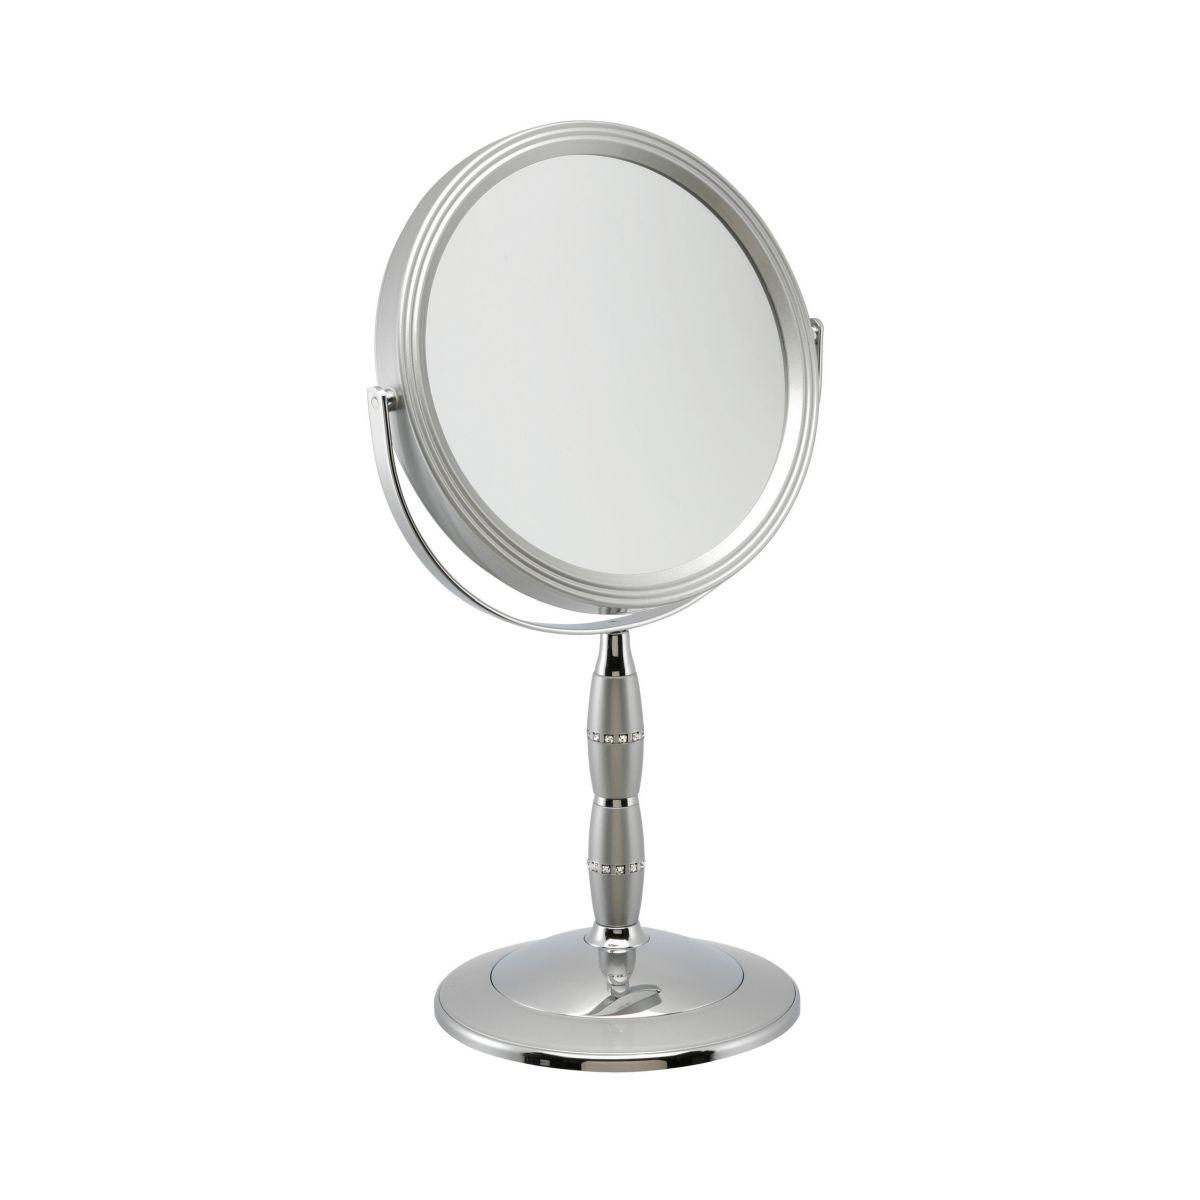 7808 18 silv - 7x Magnification Mirror with Swarovski - 7808/18S